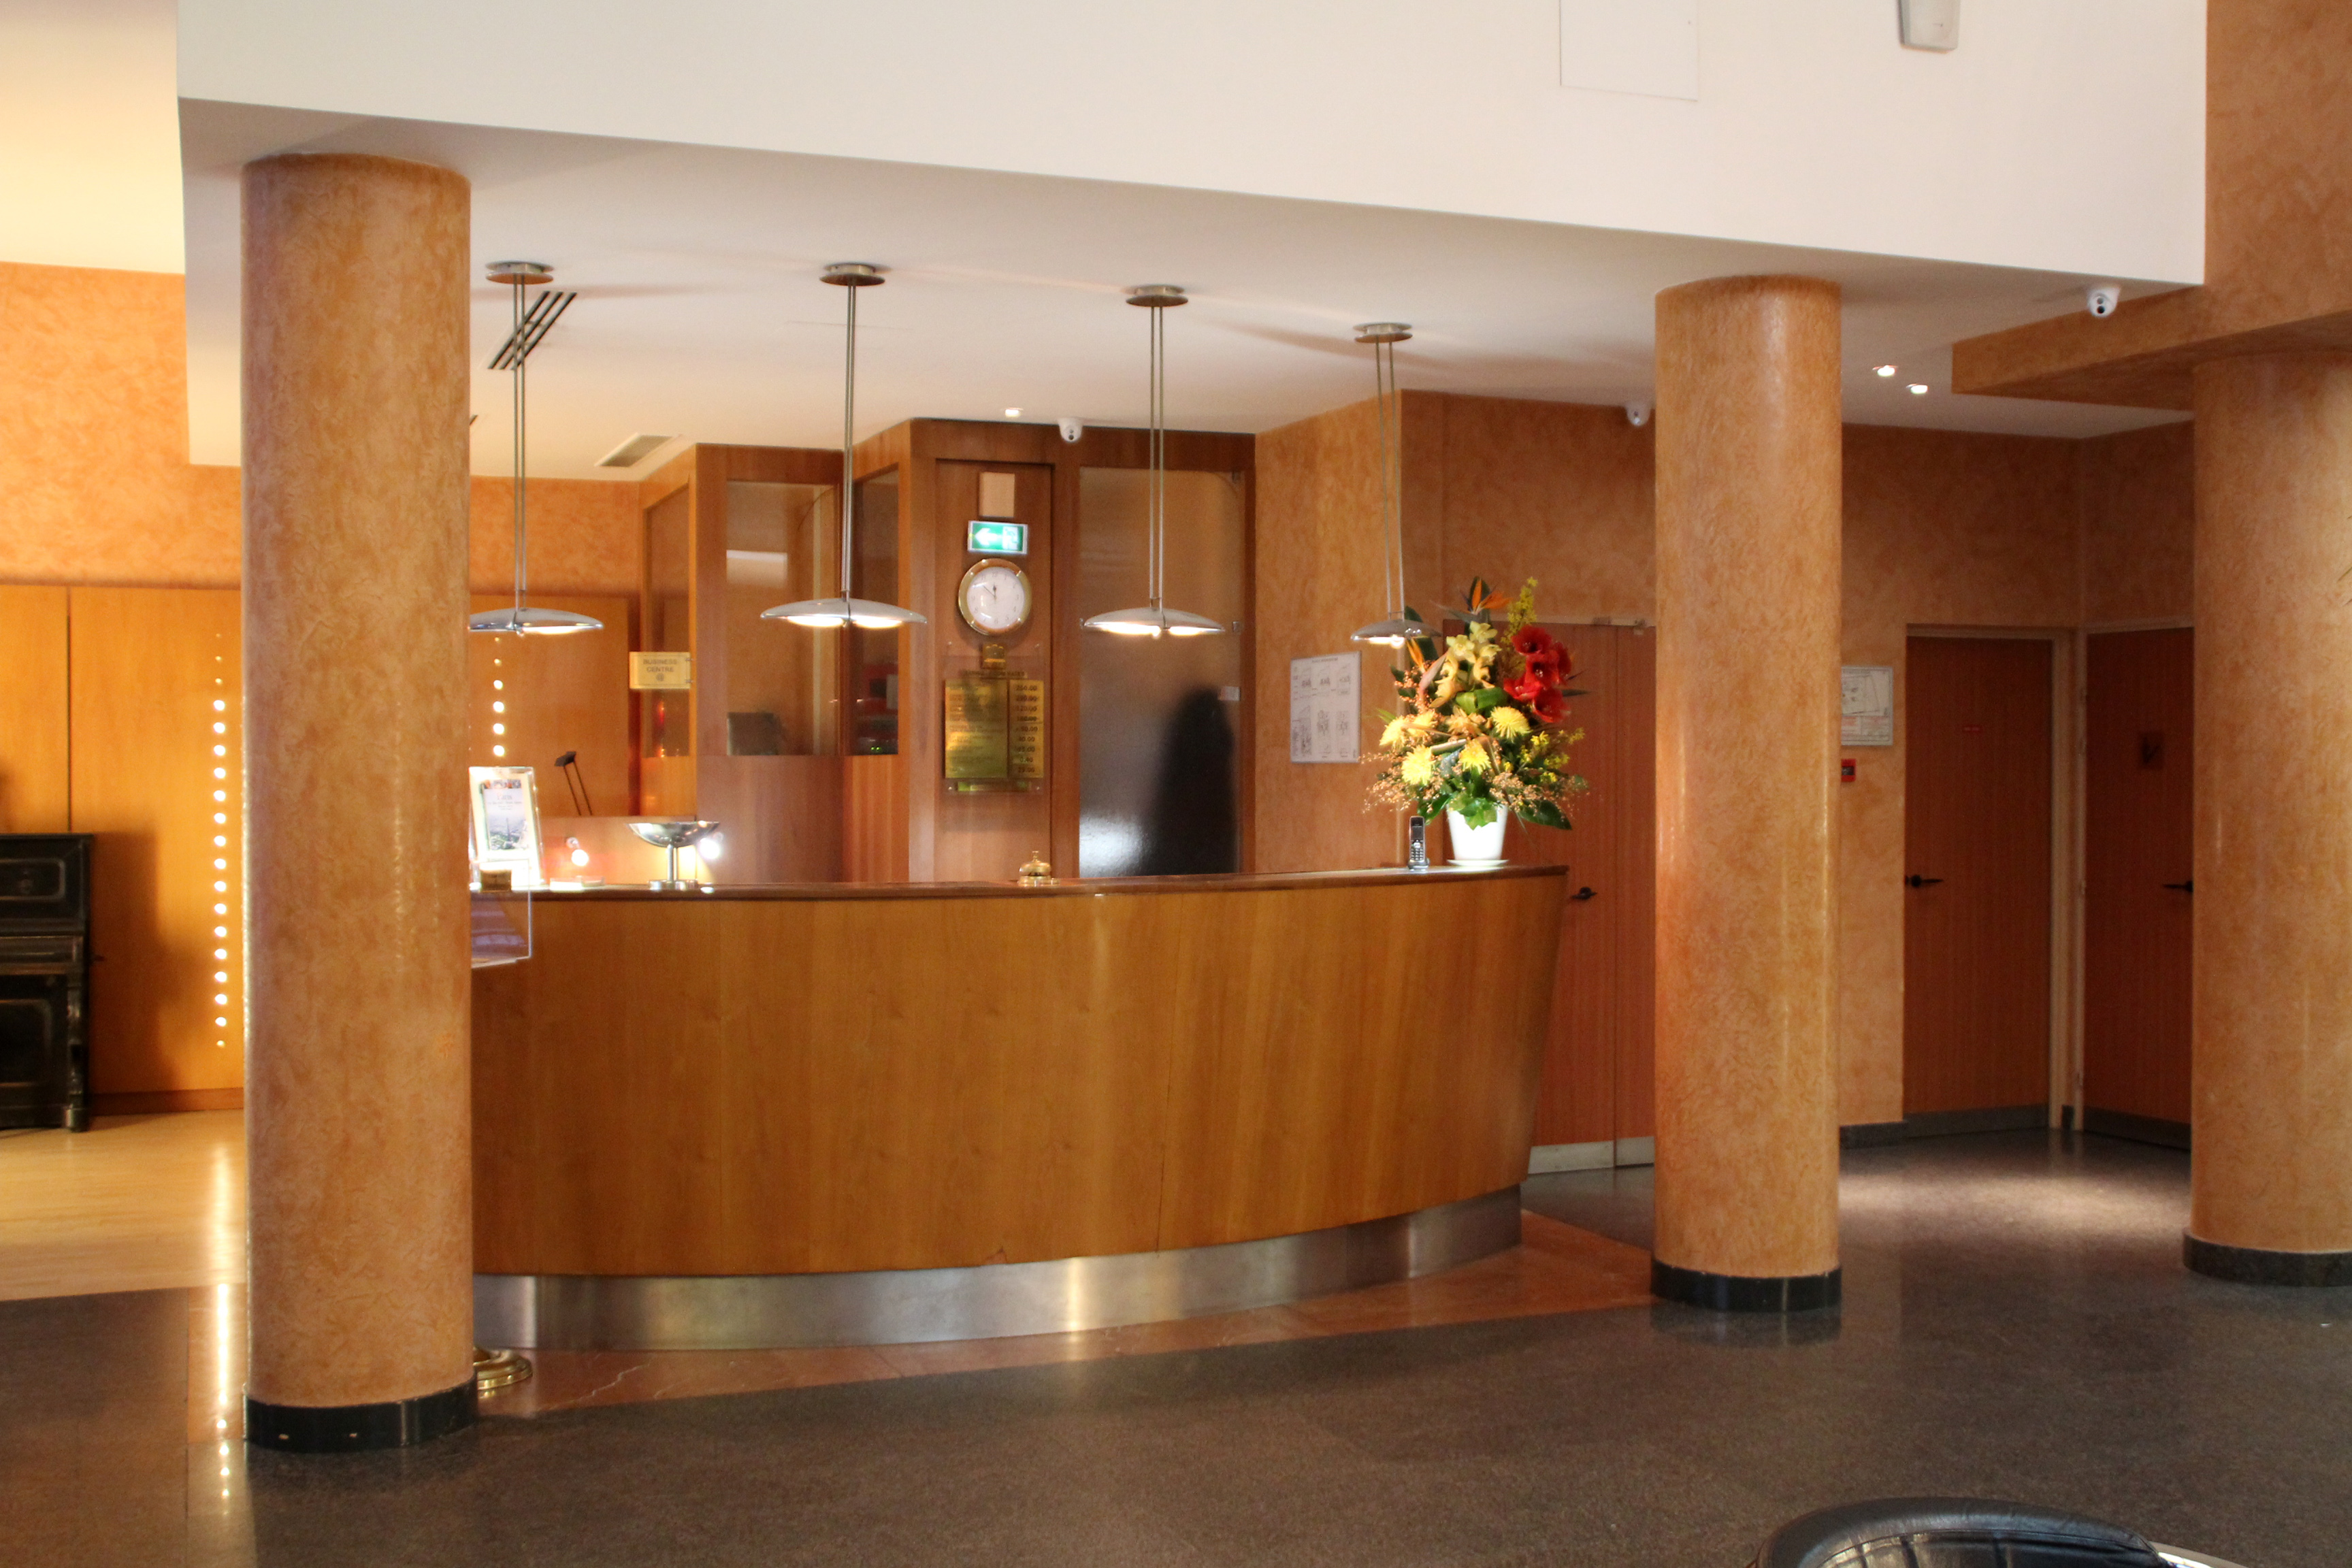 filereception front desk 1 paris opera cadet hoteljpg - Eclectic Hotel 2015